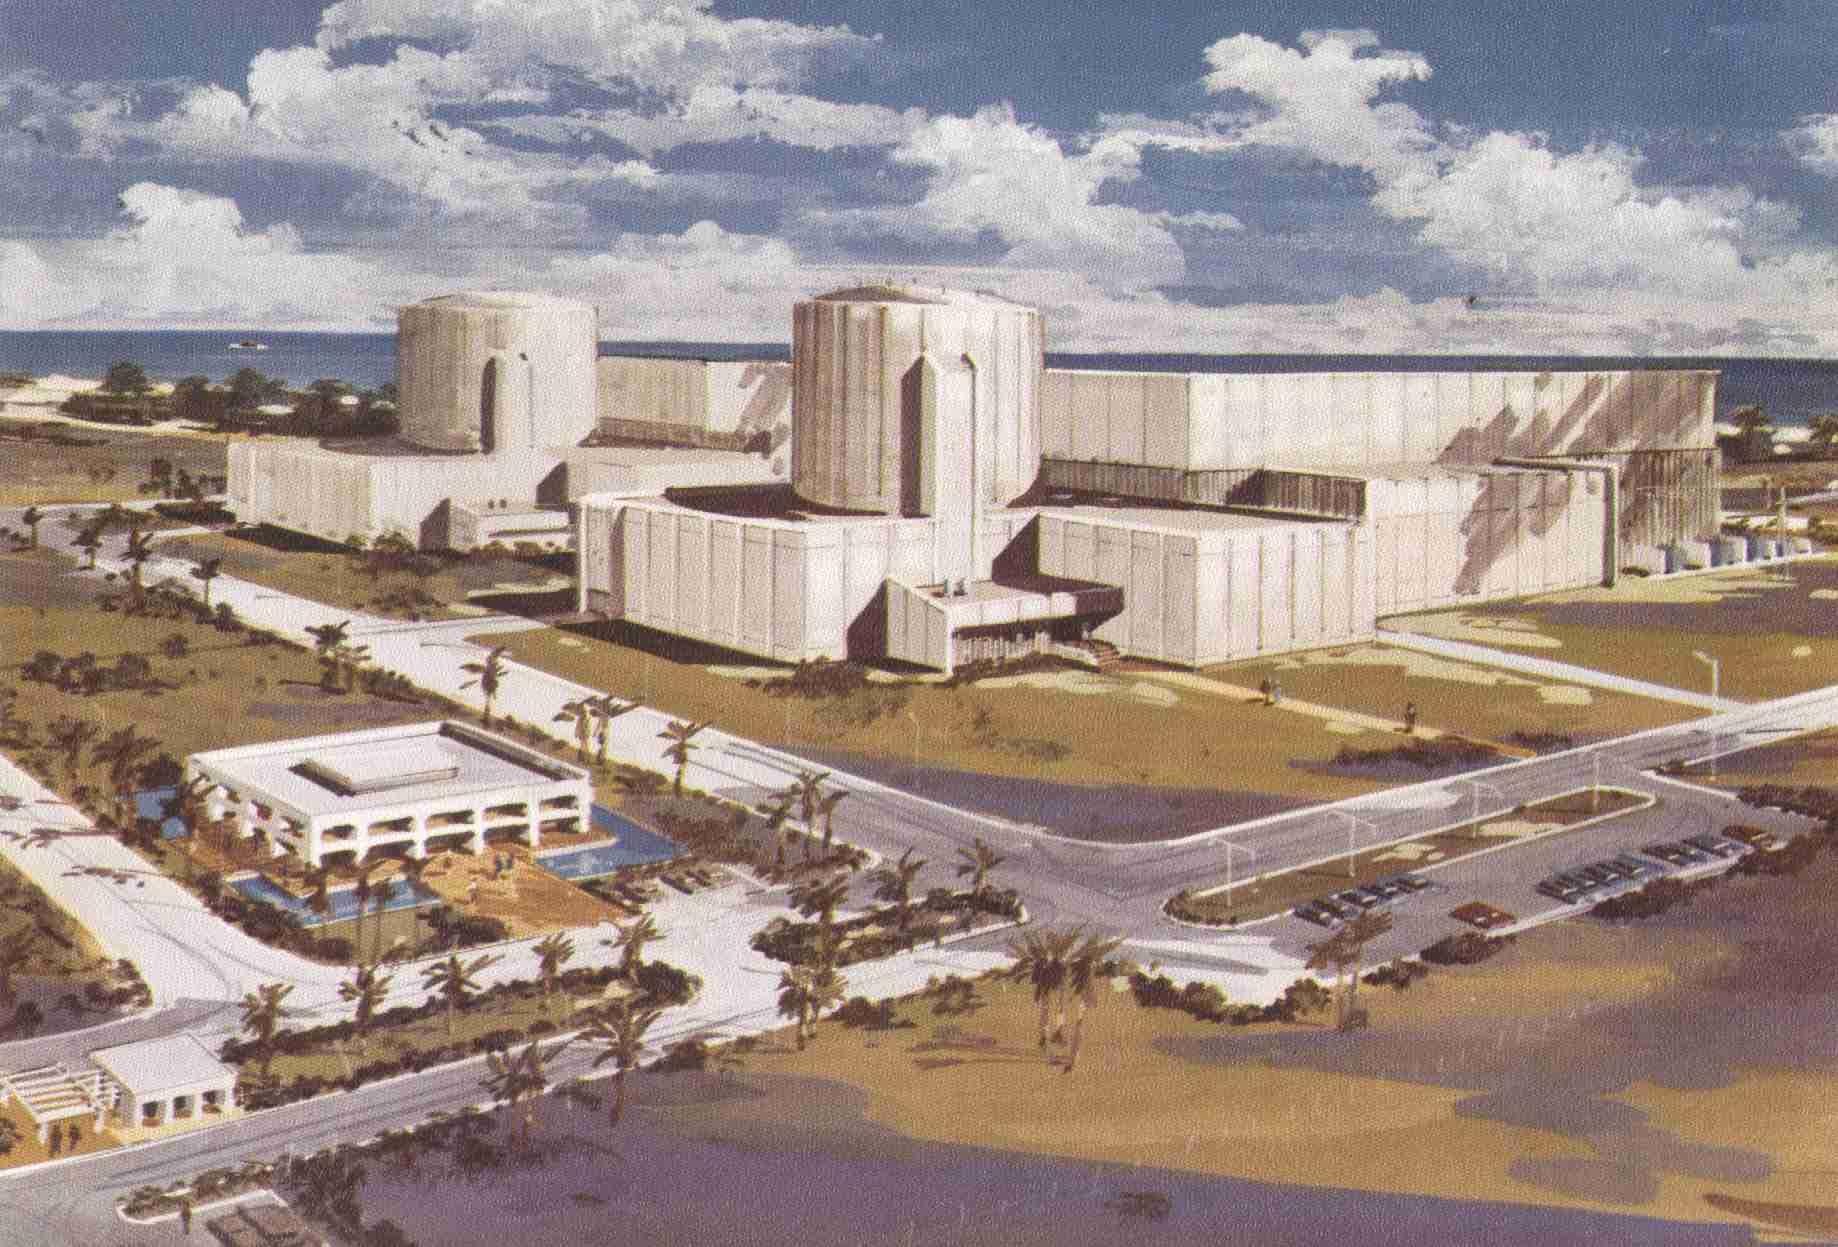 Rusko zahájilo průzkumy pro Egyptskou jadernou elektrárnu